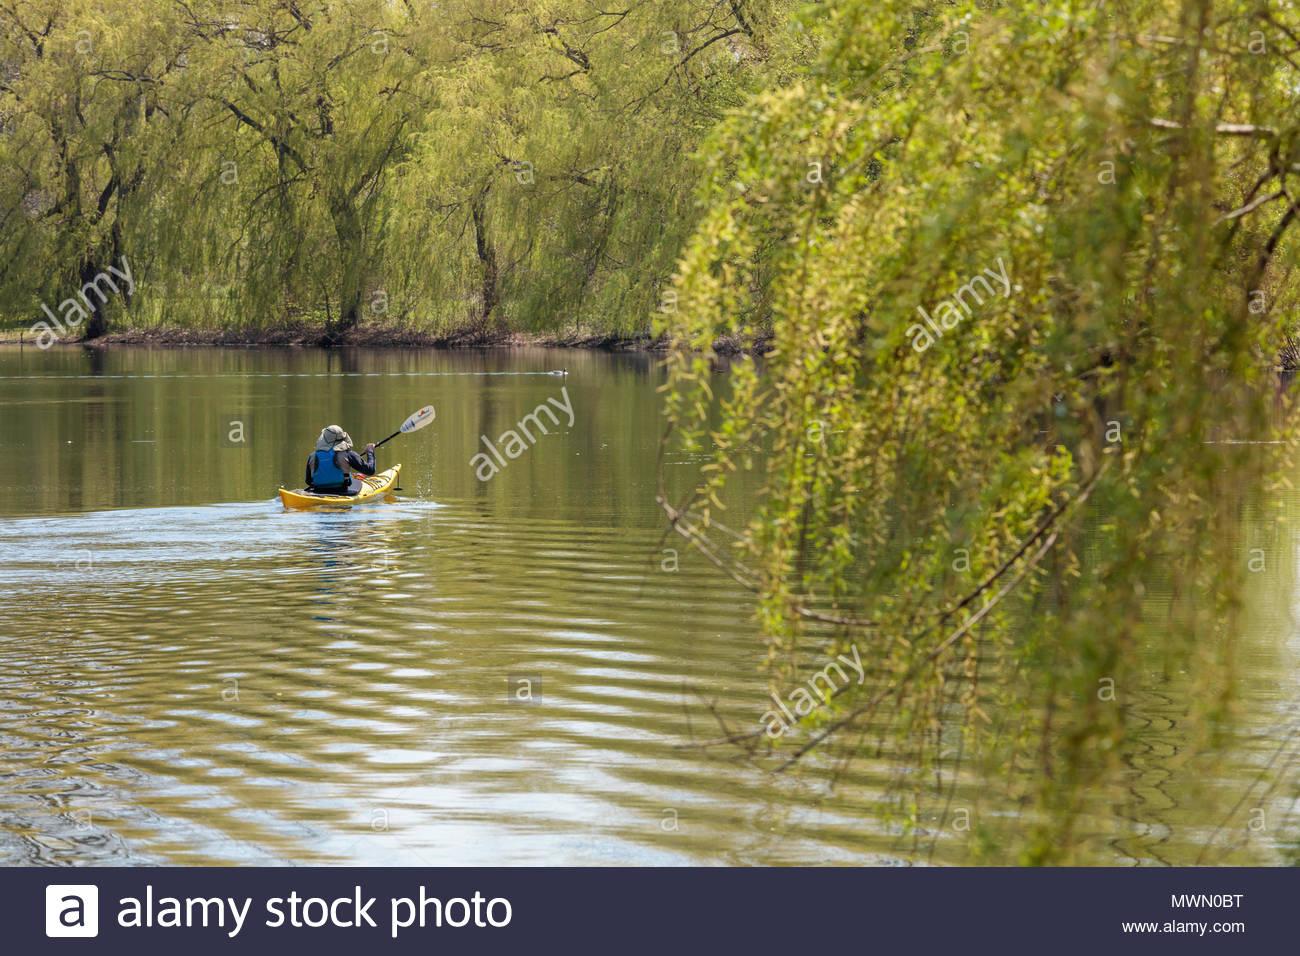 Kayak in a quiet lagoon Toronto Island Park at Toronto Ontario Canada. Stock Photo